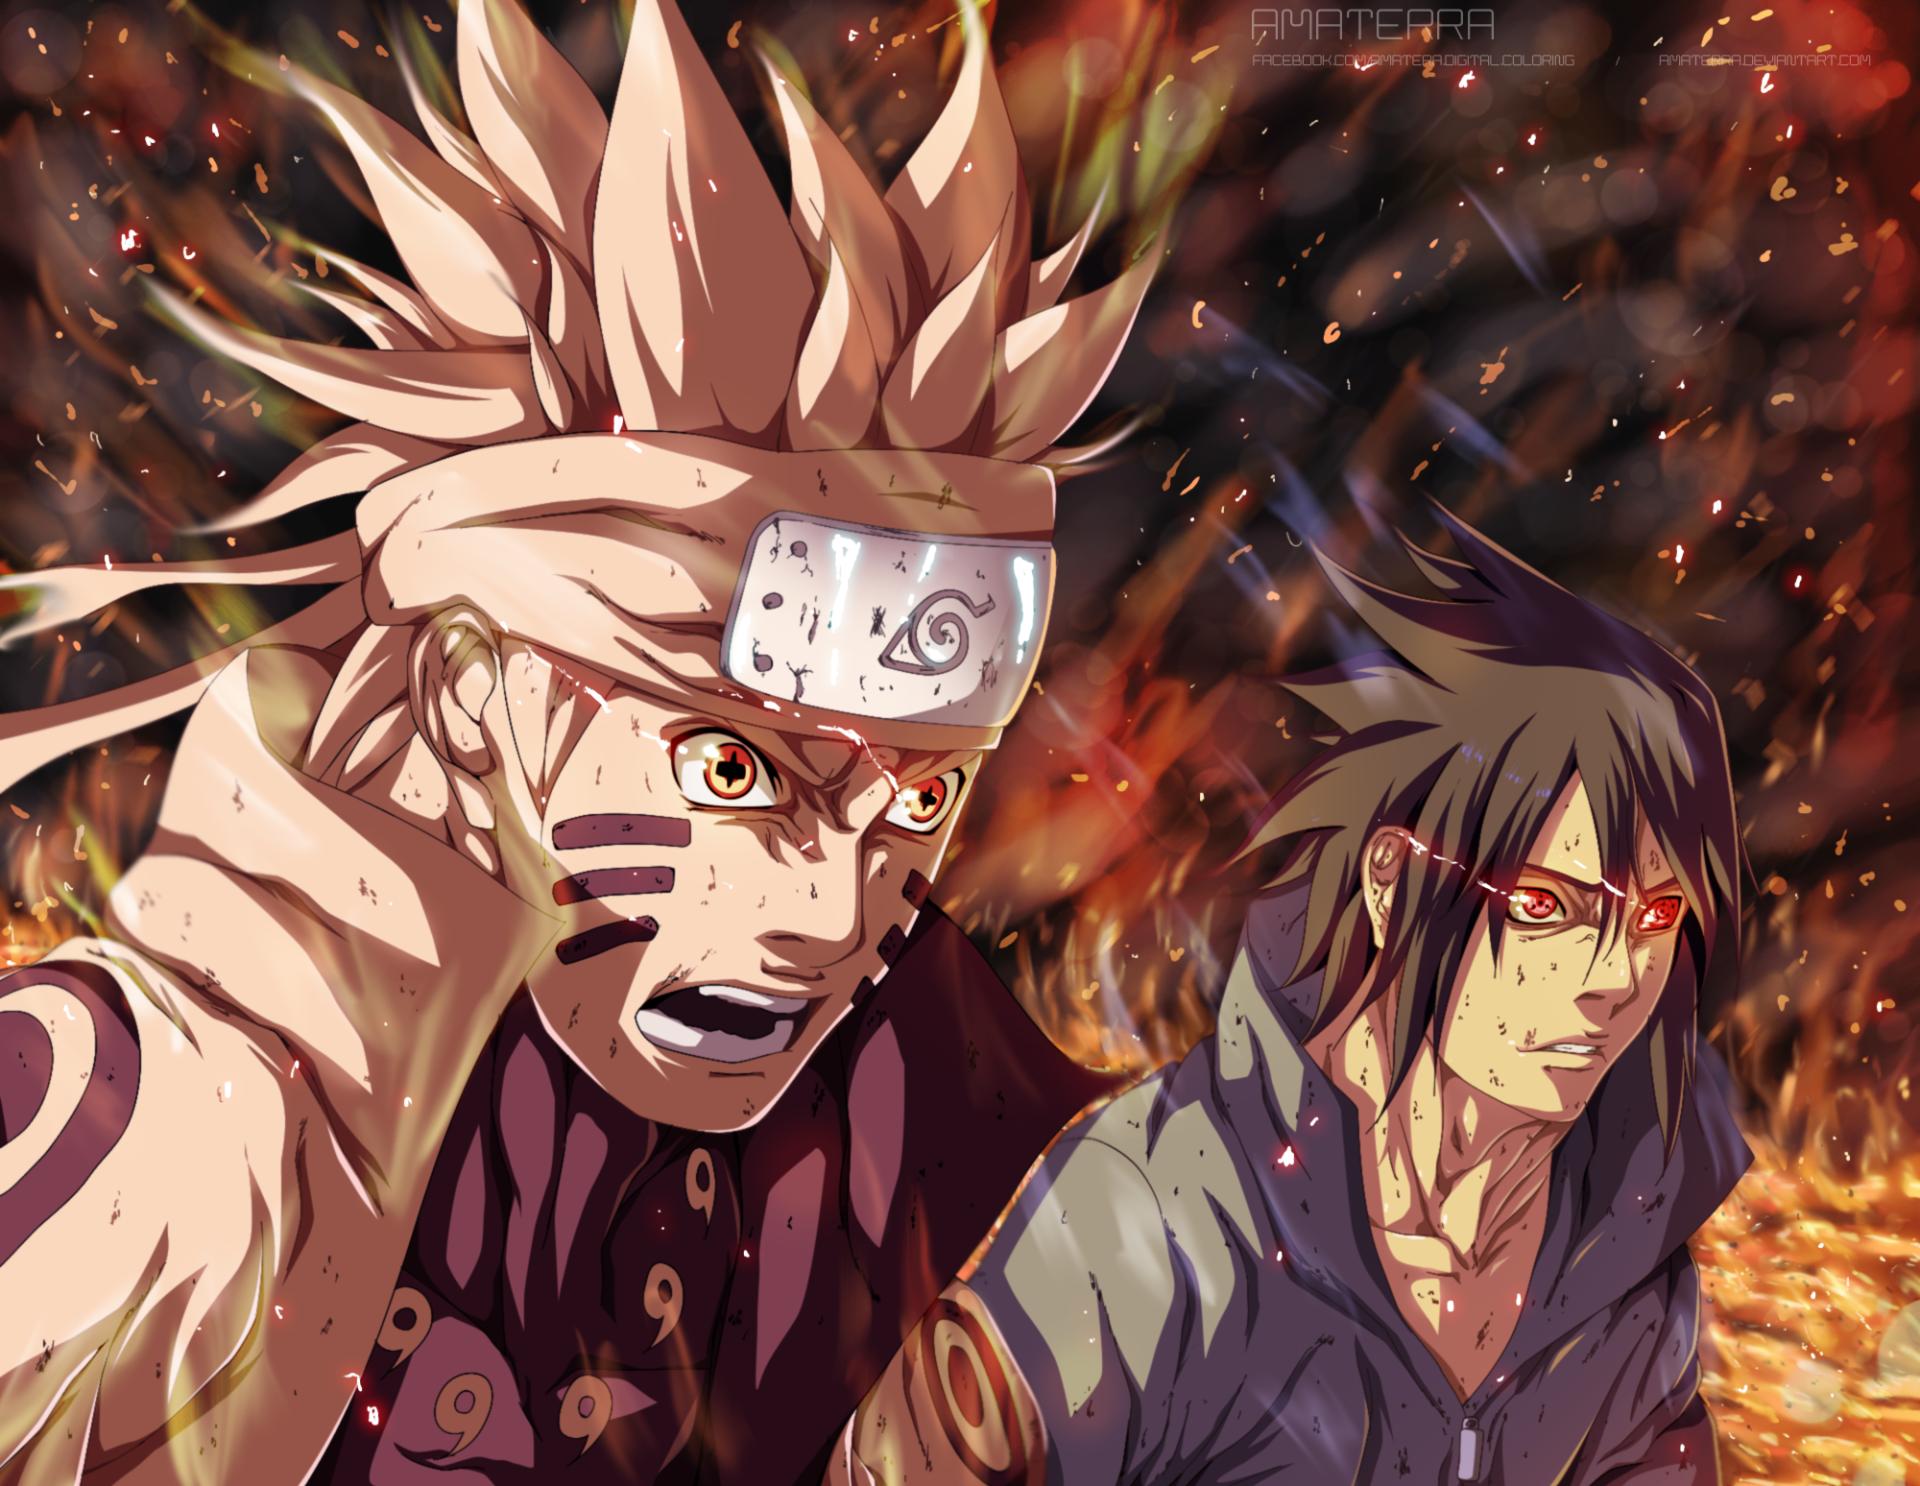 Naruto Fond d'écran HD | Arrière-Plan | 2000x1548 | ID:940012 - Wallpaper Abyss